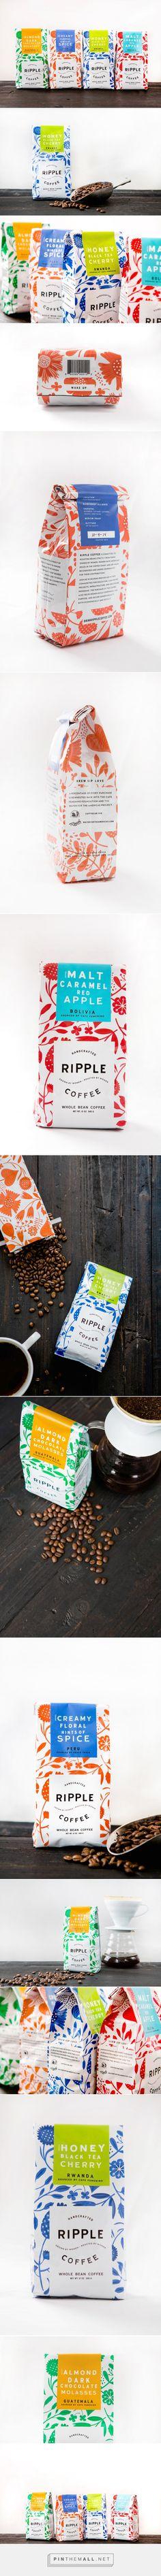 Ripple Coffee on Behance - created via https://pinthemall.net